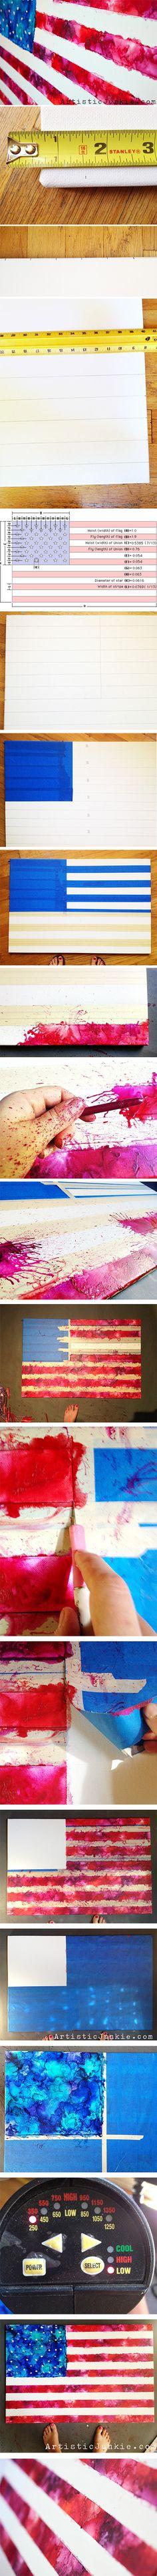 Crayon American Flags